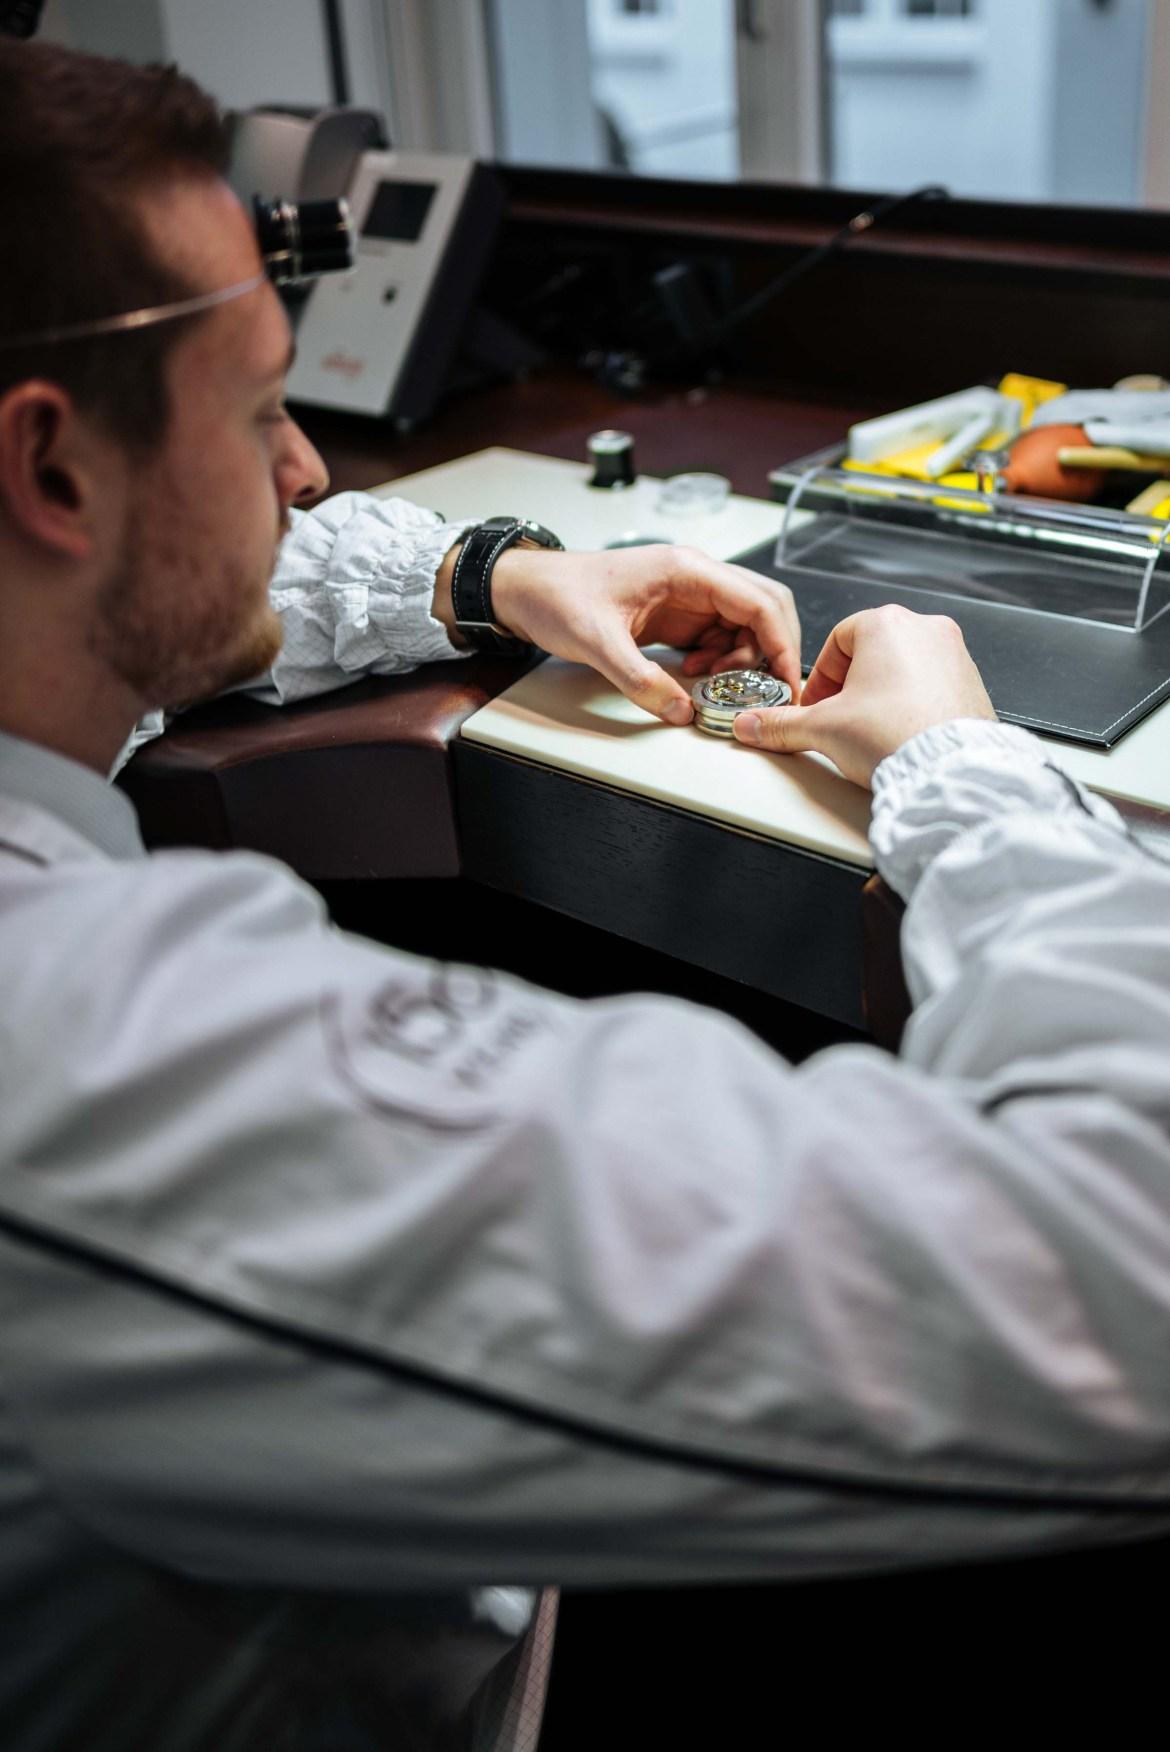 Watch maker shows The Taste how to make a watch at the IWC museum in schaffhausen Switzerland